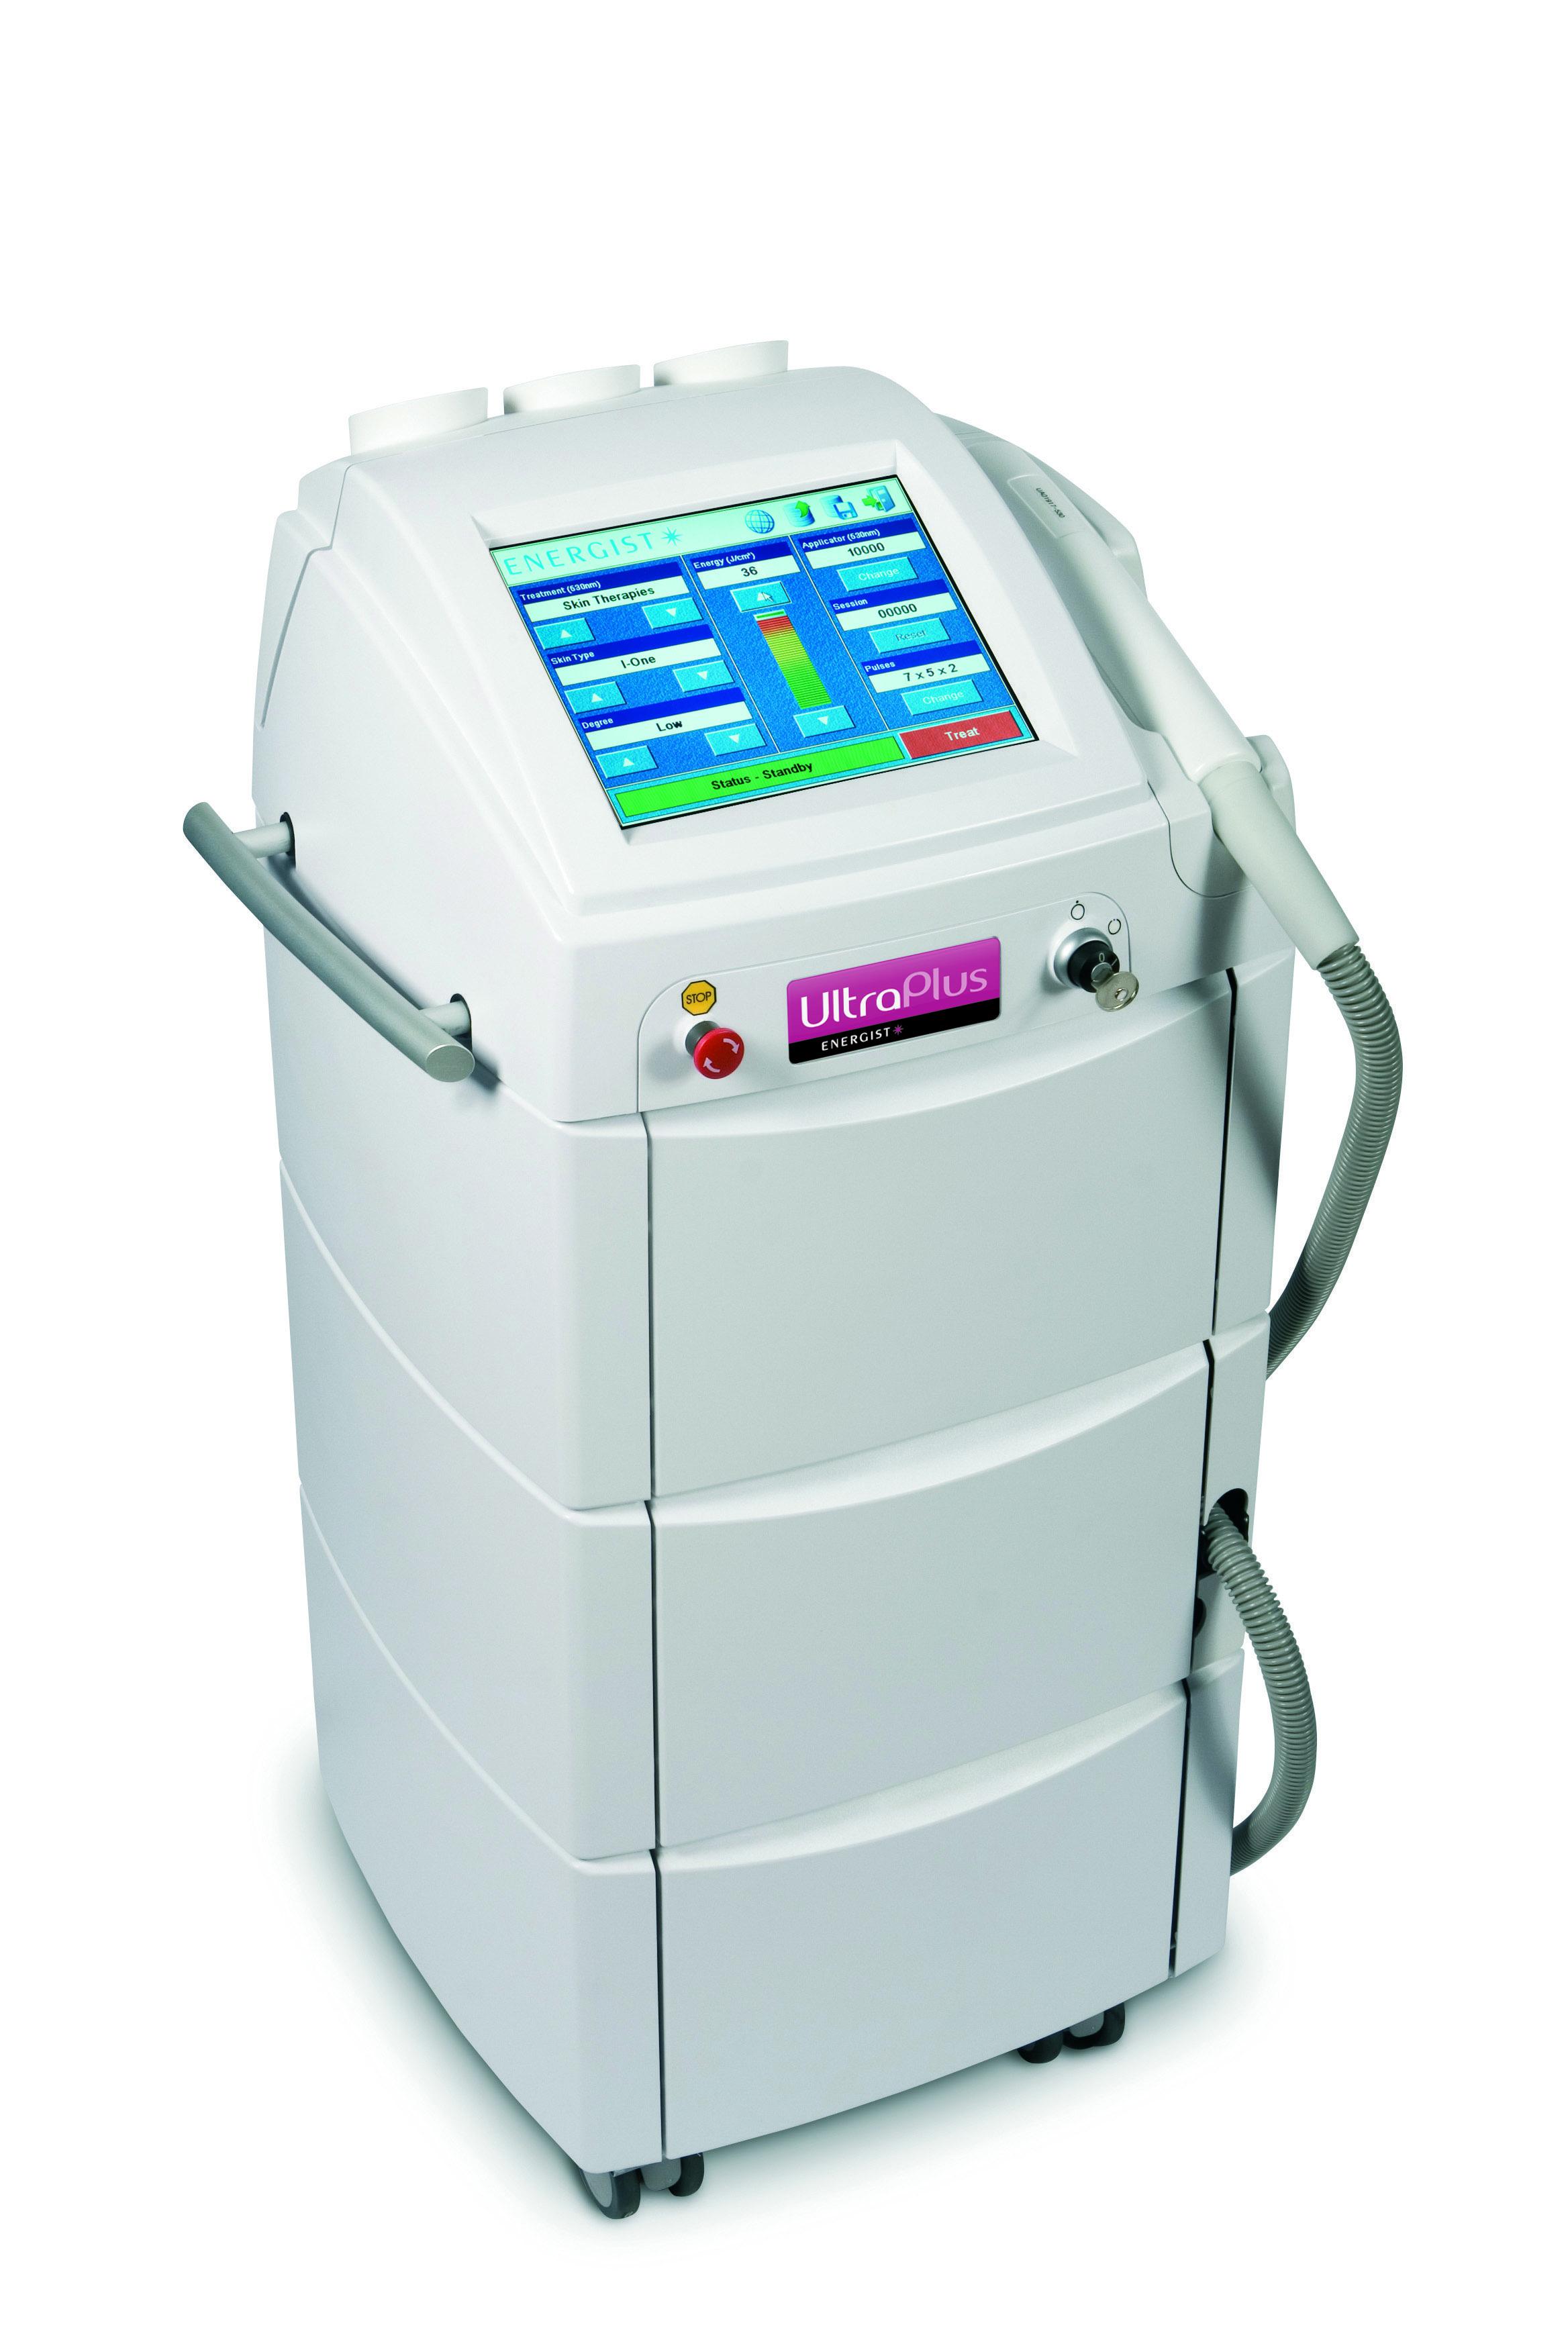 Energist Ultra Plus VPL